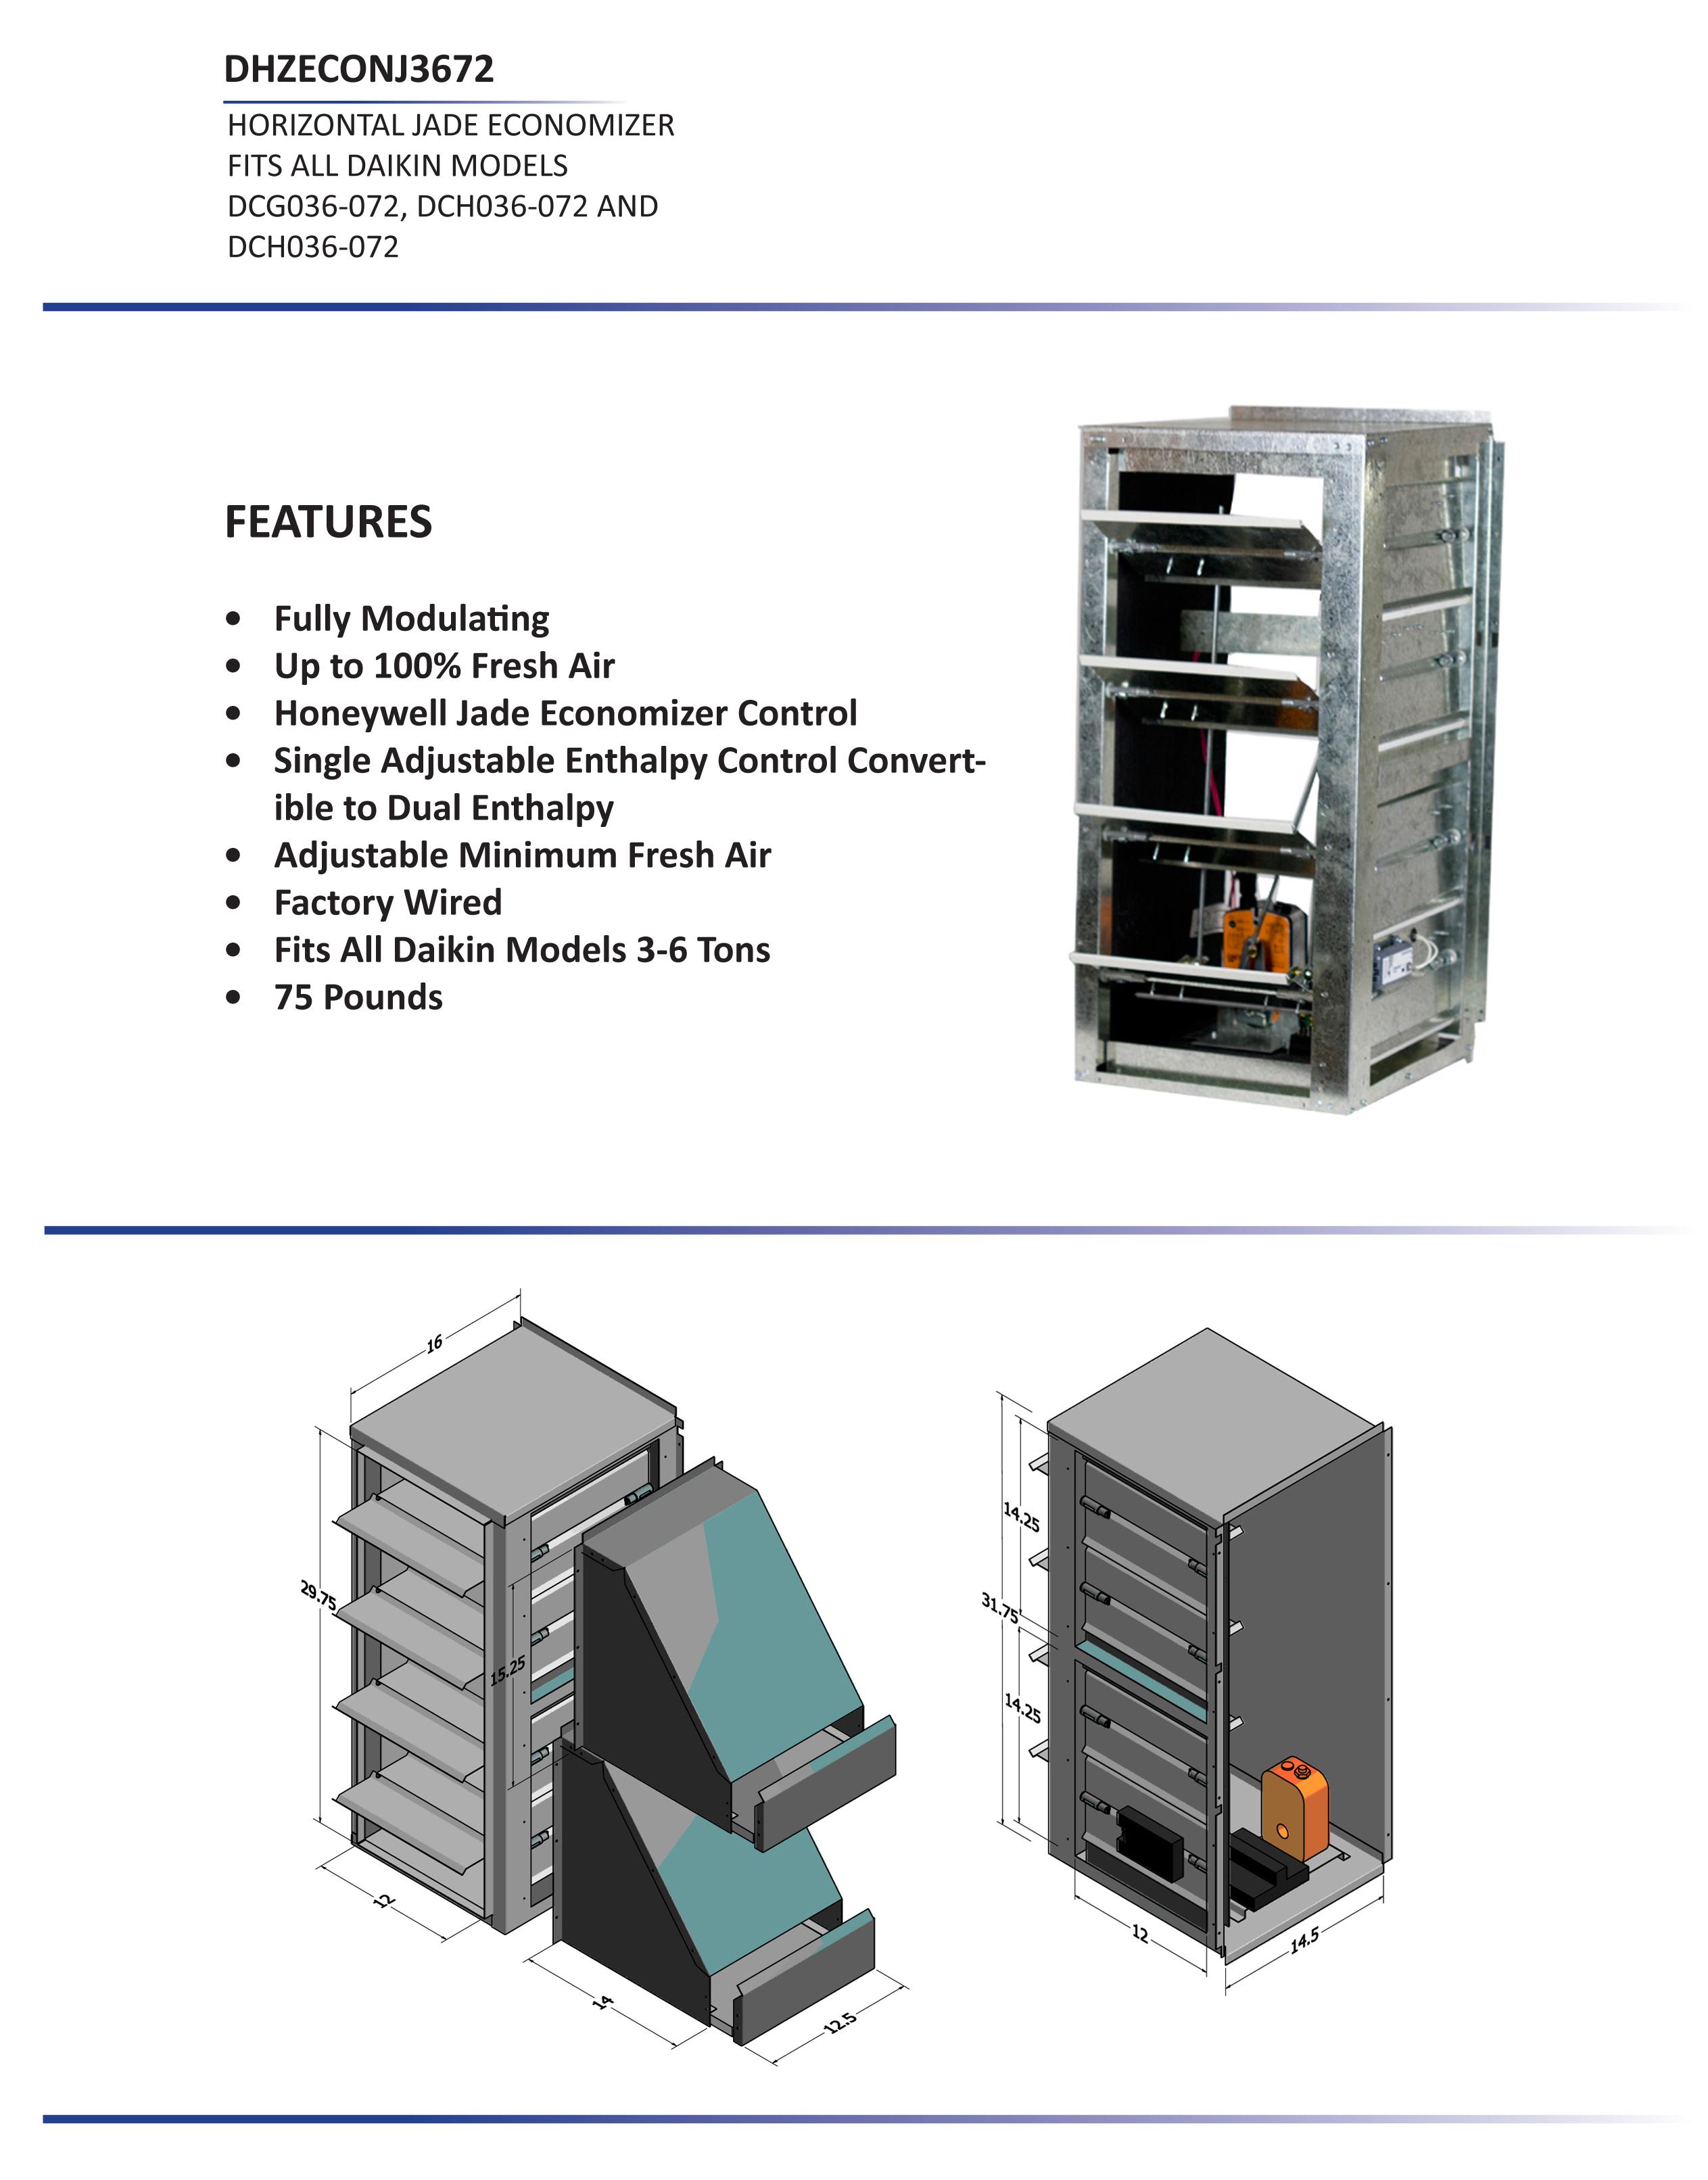 3 6 Ton Daikin Horizontal Economizer Dcc Dcg Dch Models Dhzecnj3672 Honeywell Wiring Diagram Dcc036 072 Dcg036 Dch036